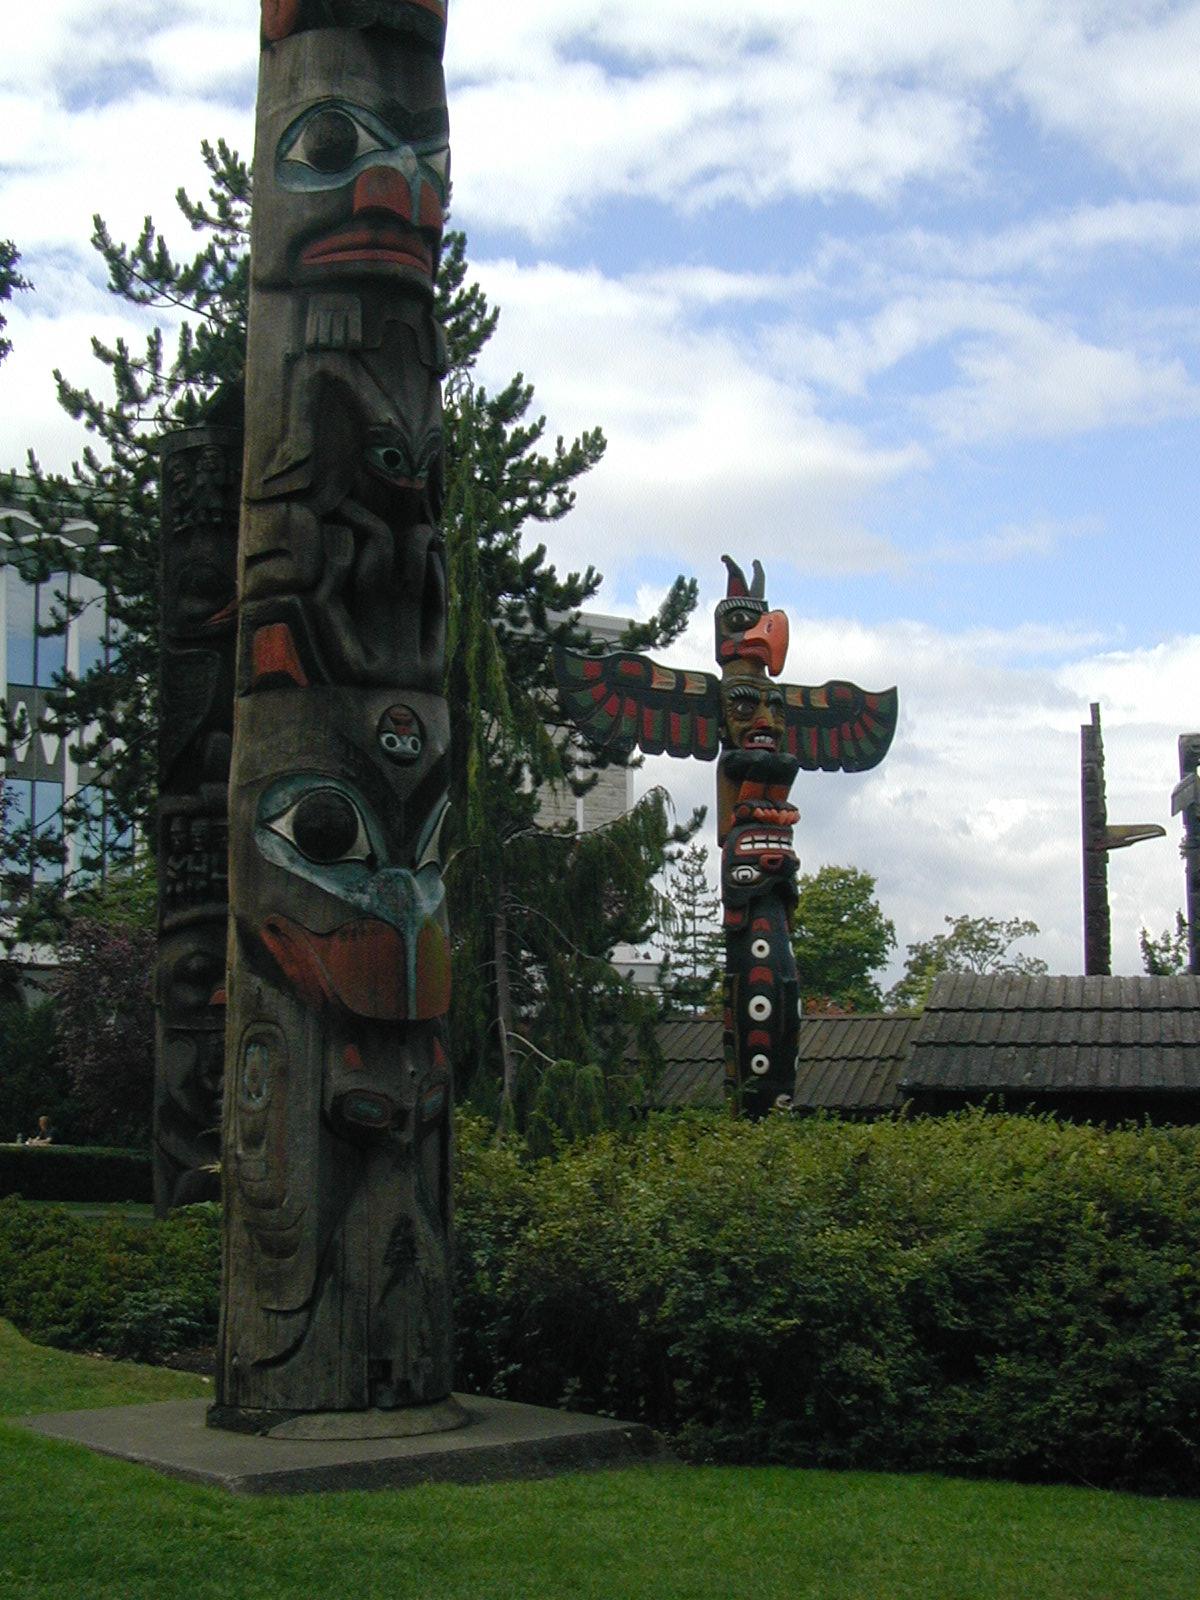 Thunderbird Park